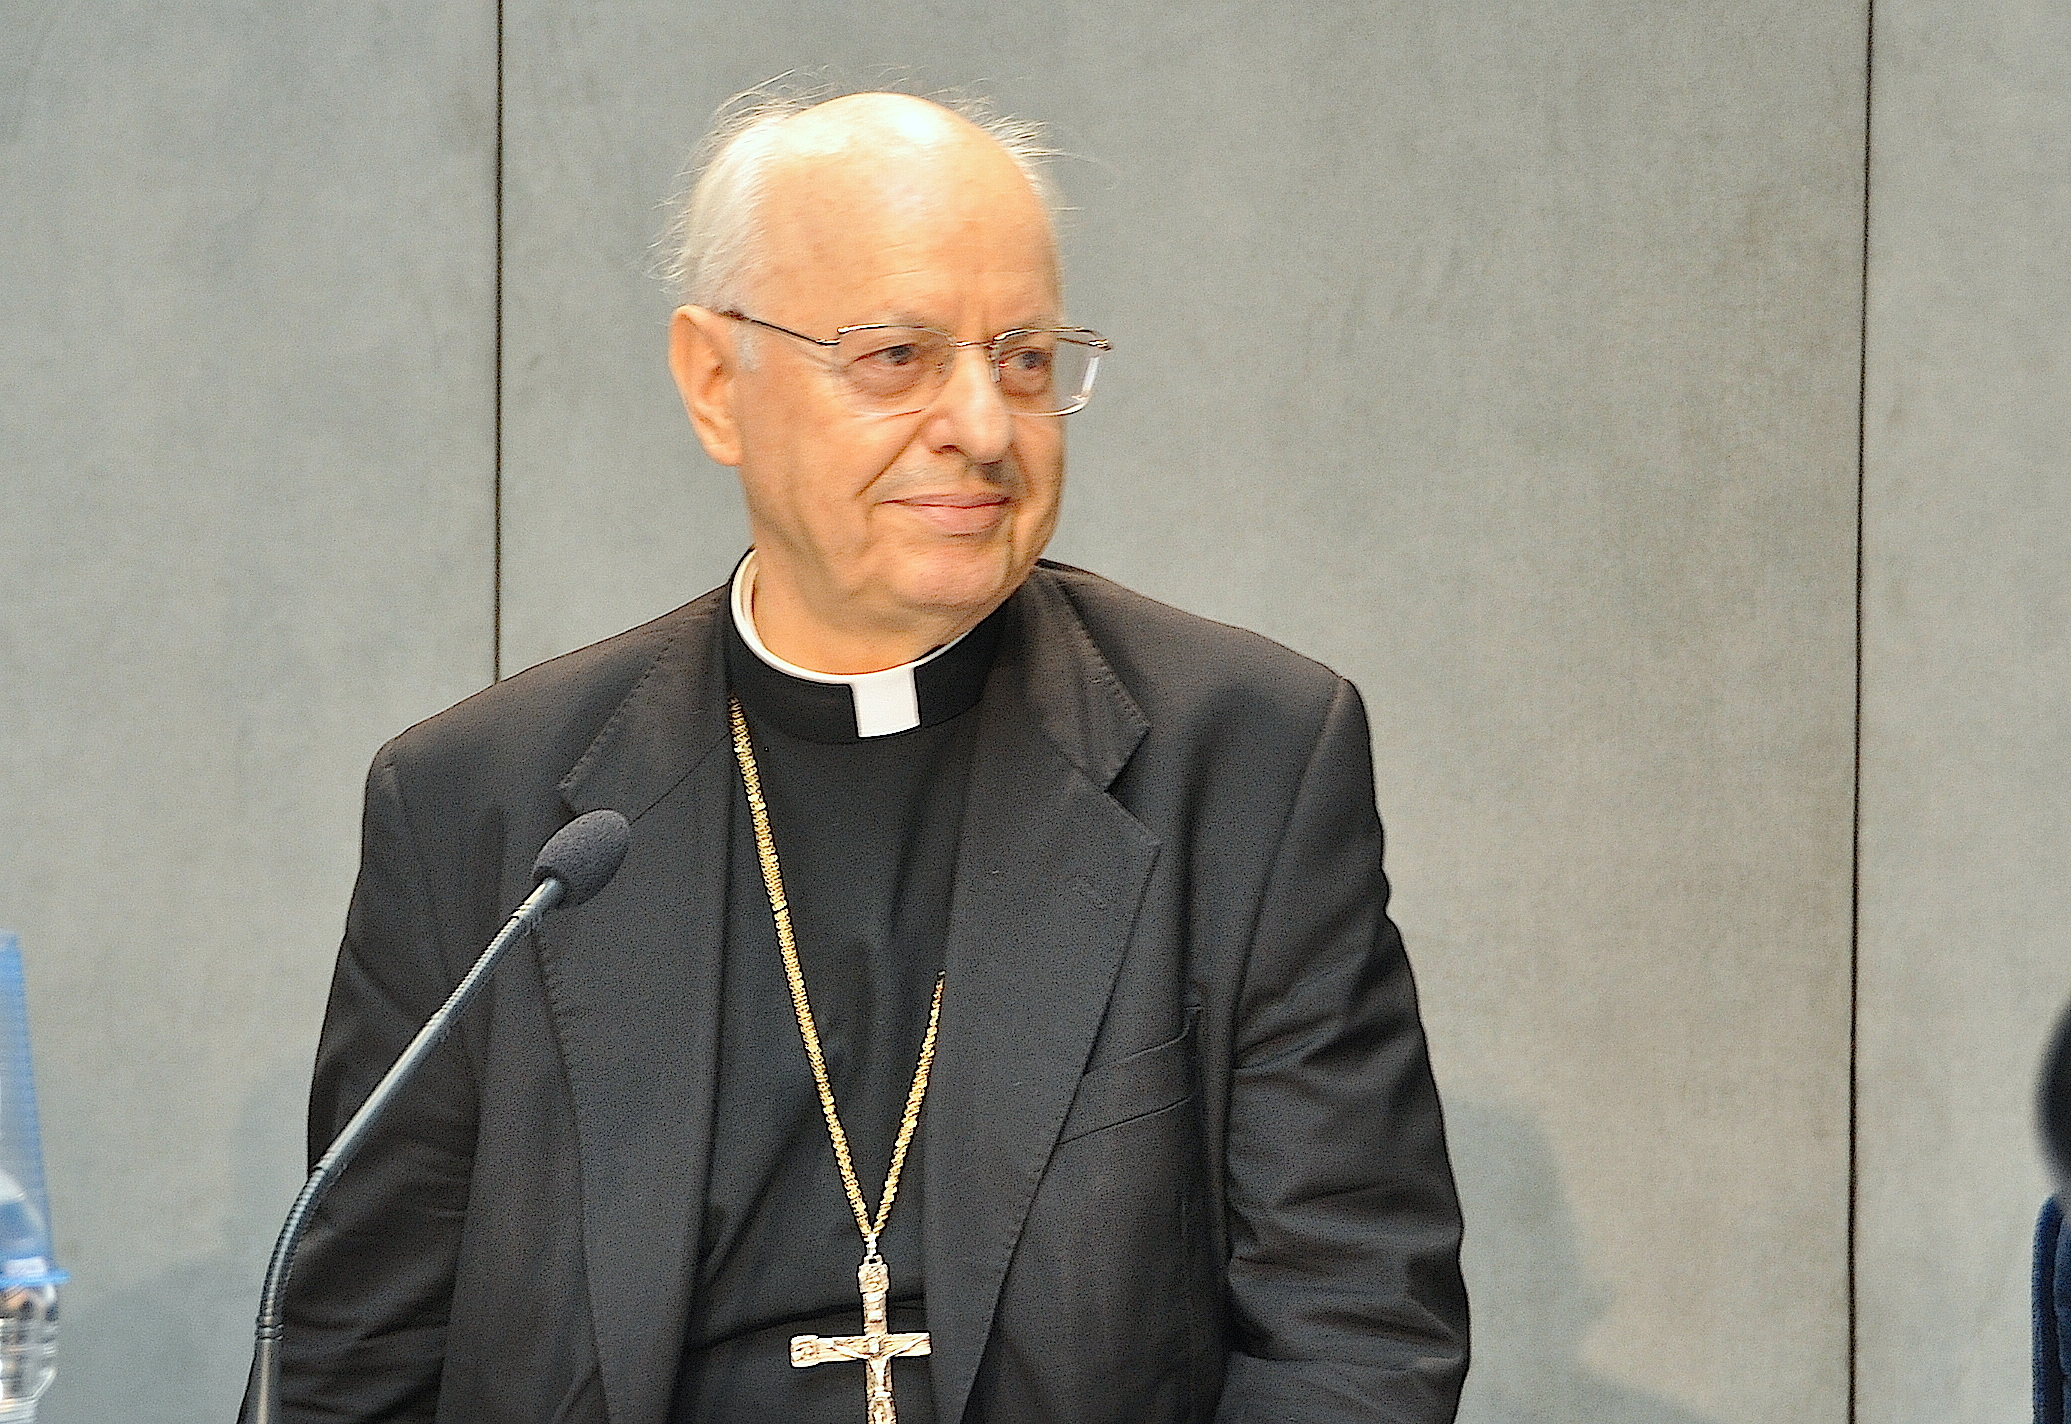 Cardinal Lorenzo Baldisseri in the press room of Holy See  - 2015 june 23